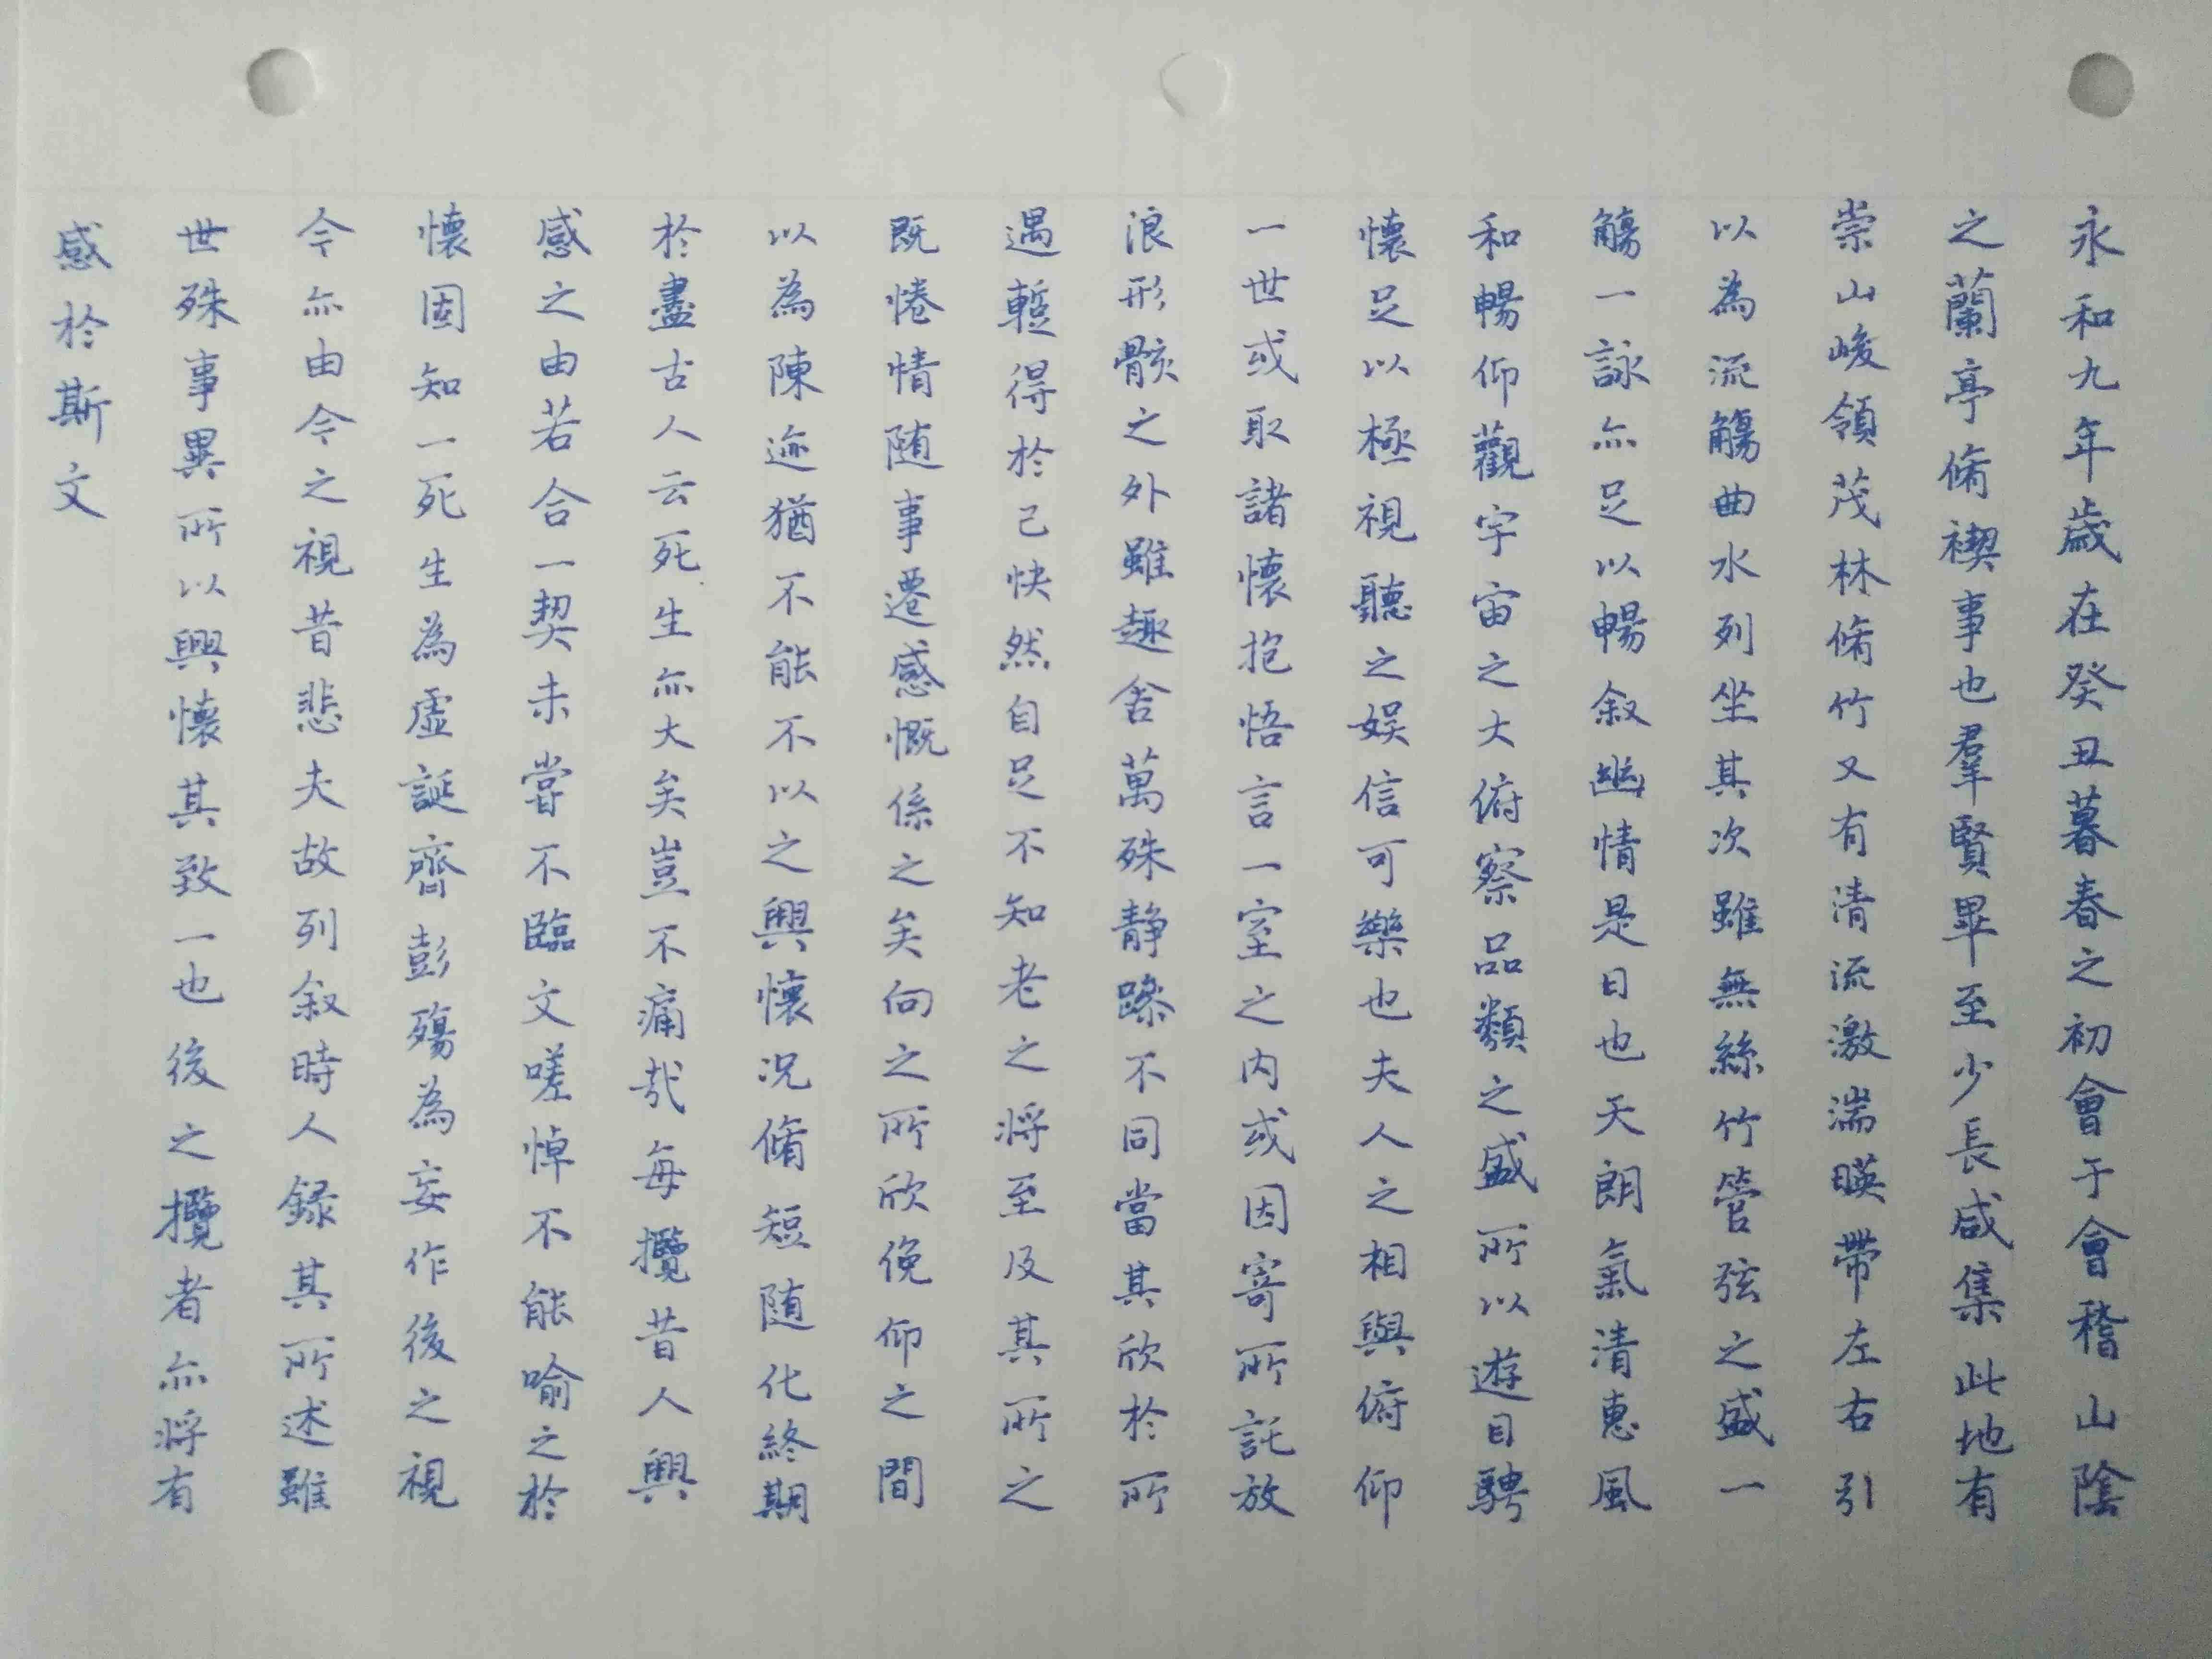 20181226兰亭楷2small.jpg